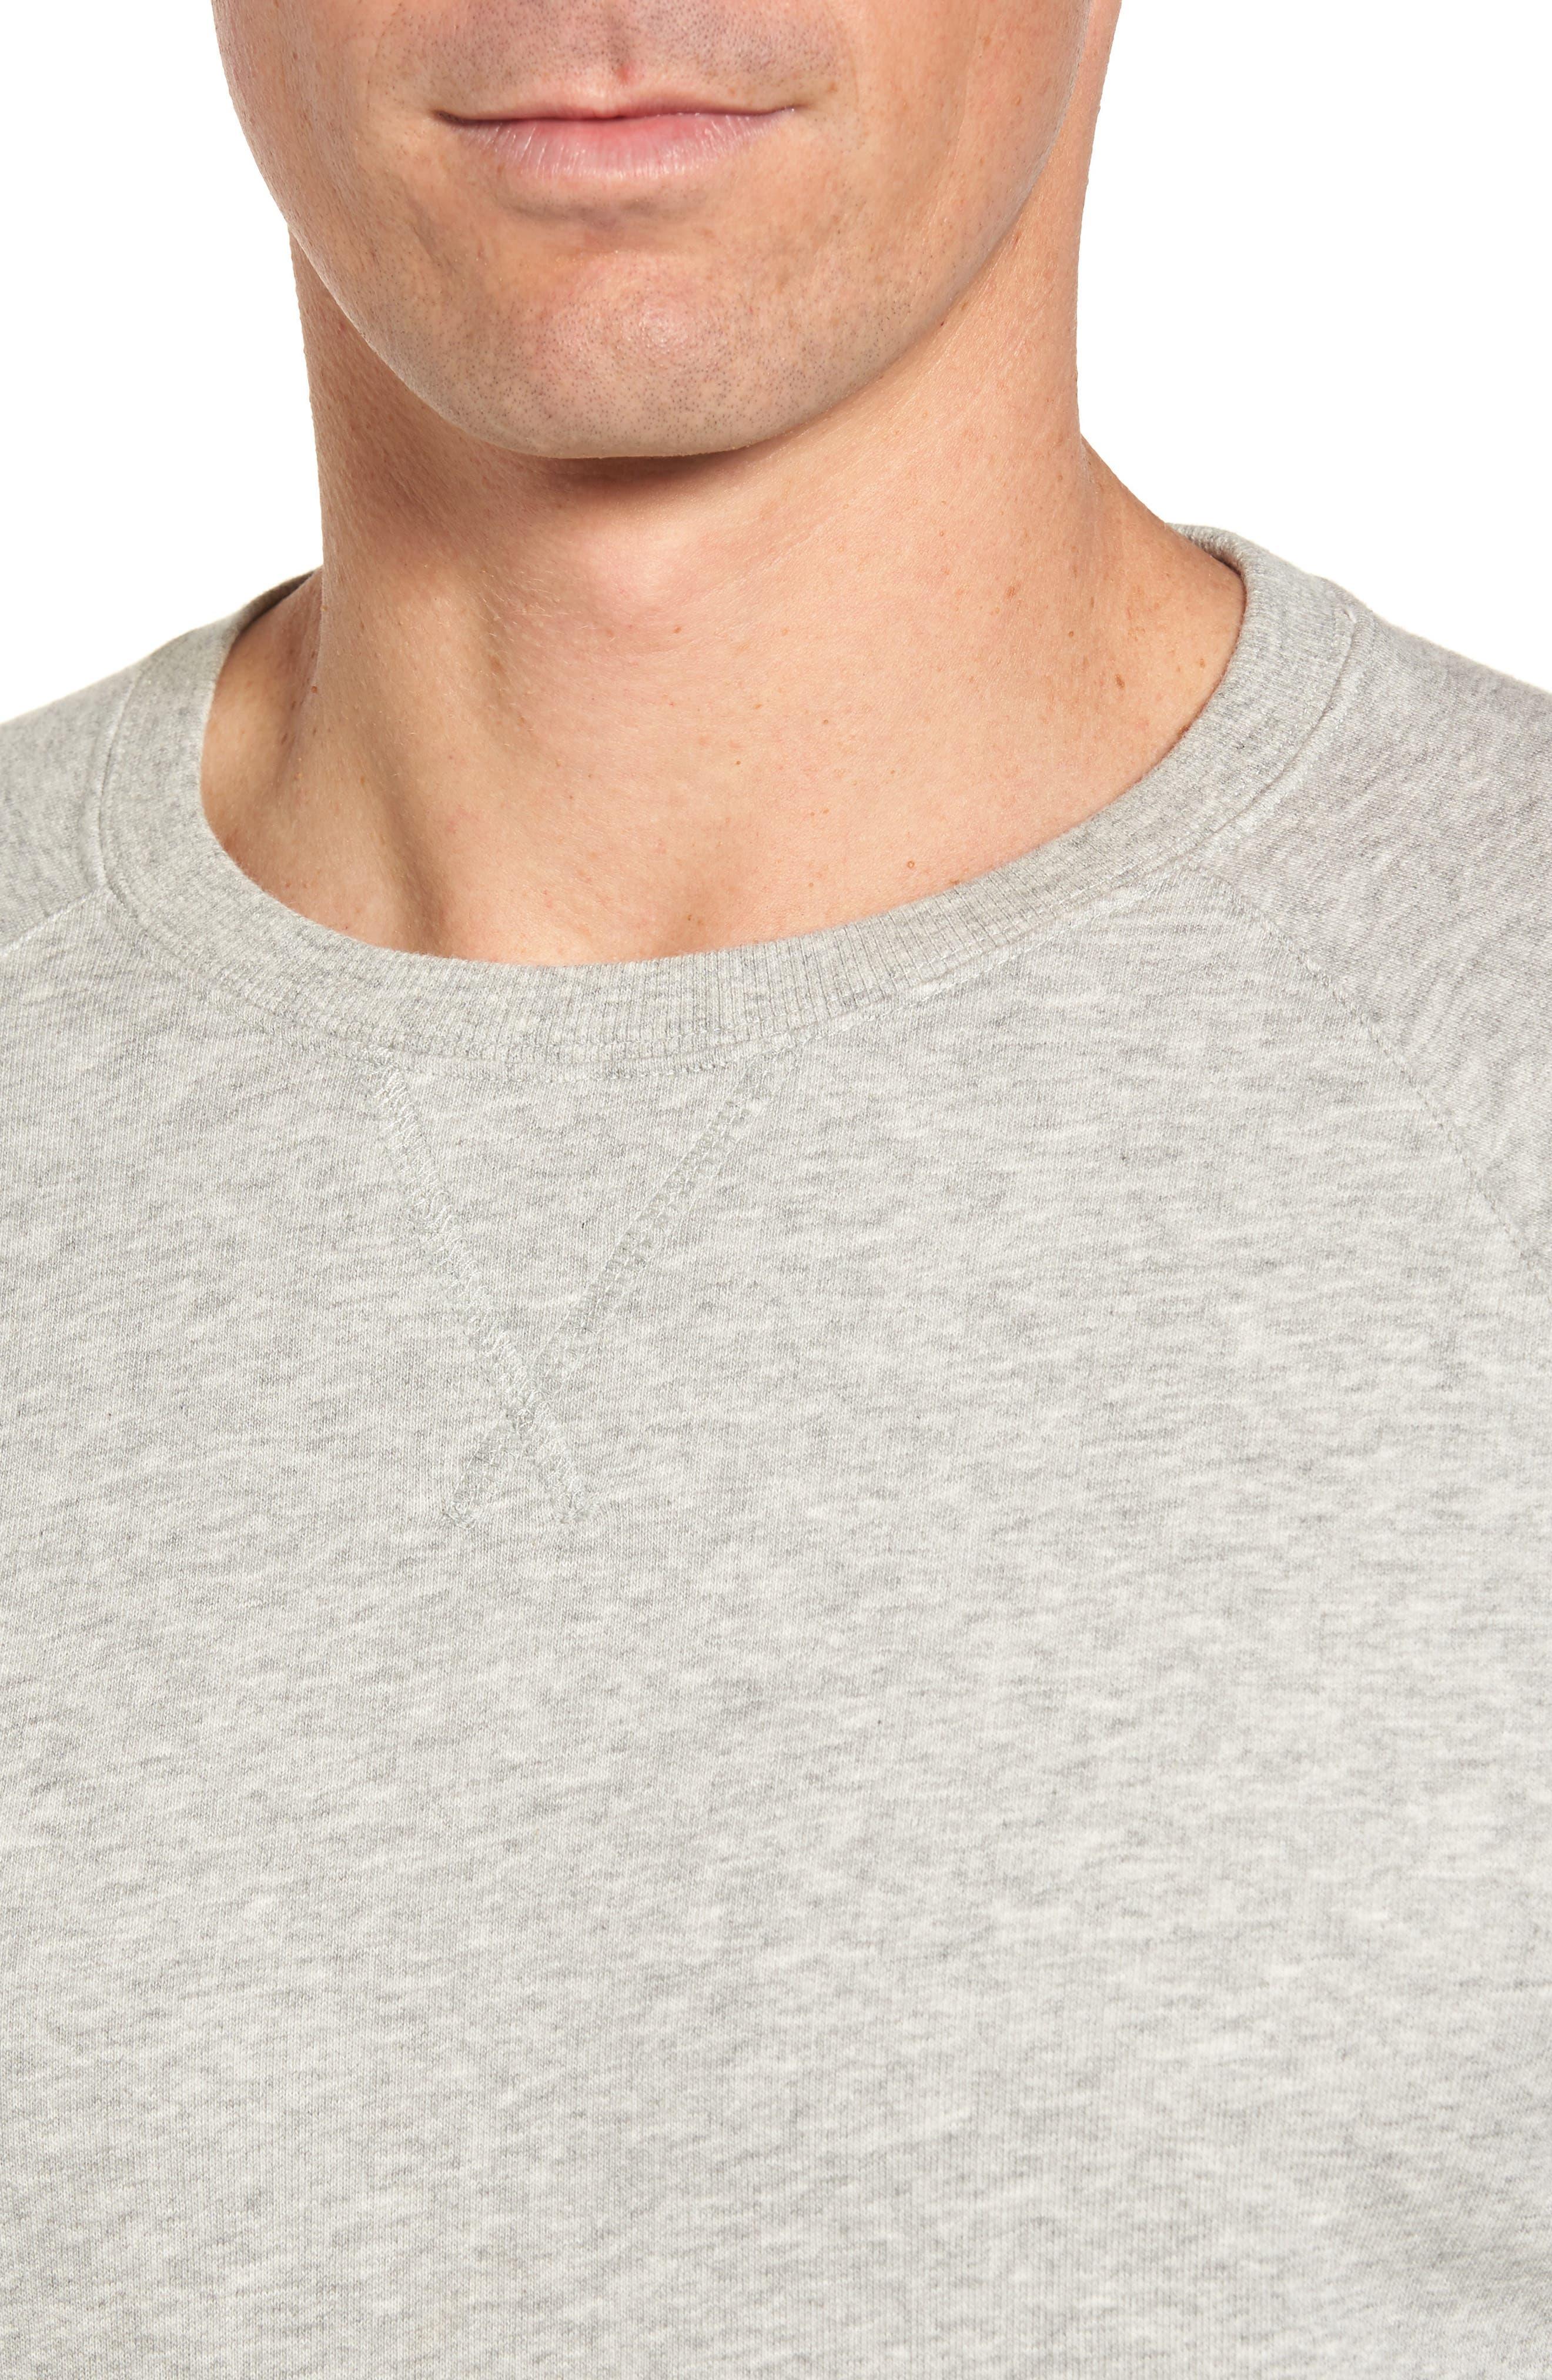 Lounge Crewneck Sweatshirt,                             Alternate thumbnail 4, color,                             Grey Heather